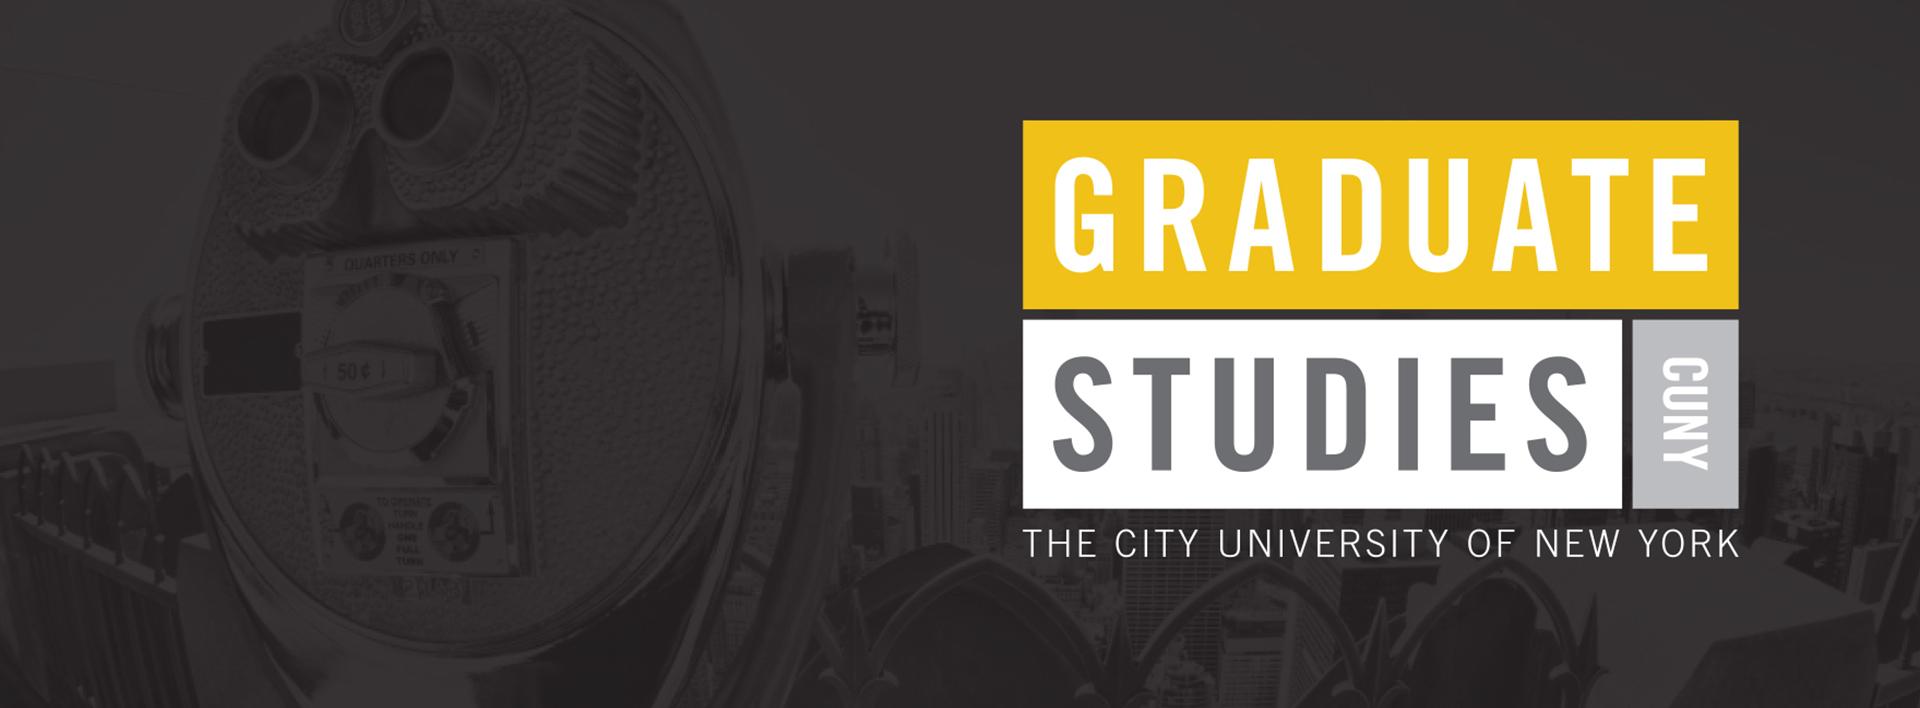 CUNY GRADUATE STUDIES banner